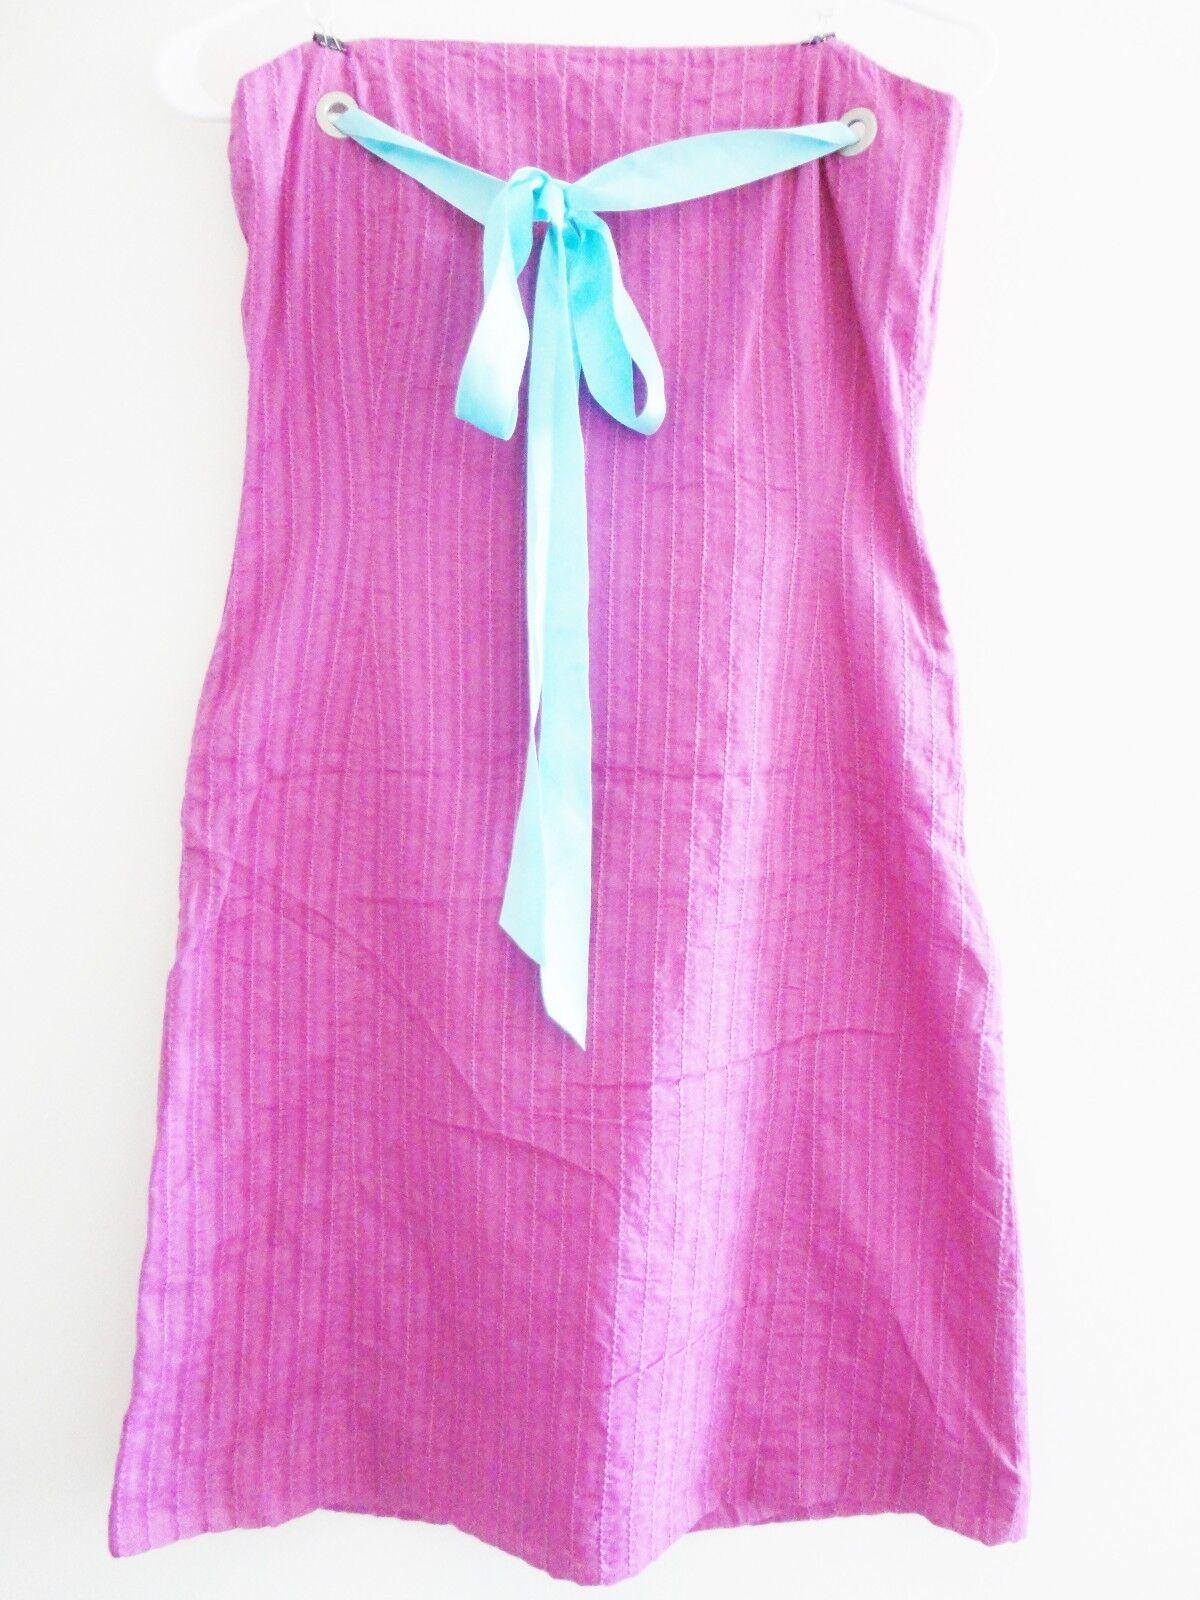 NEW PORTS PINK blueE SHOULDER DESIGNER DRESS LIMITED EDITION 100% AUTHENTIC